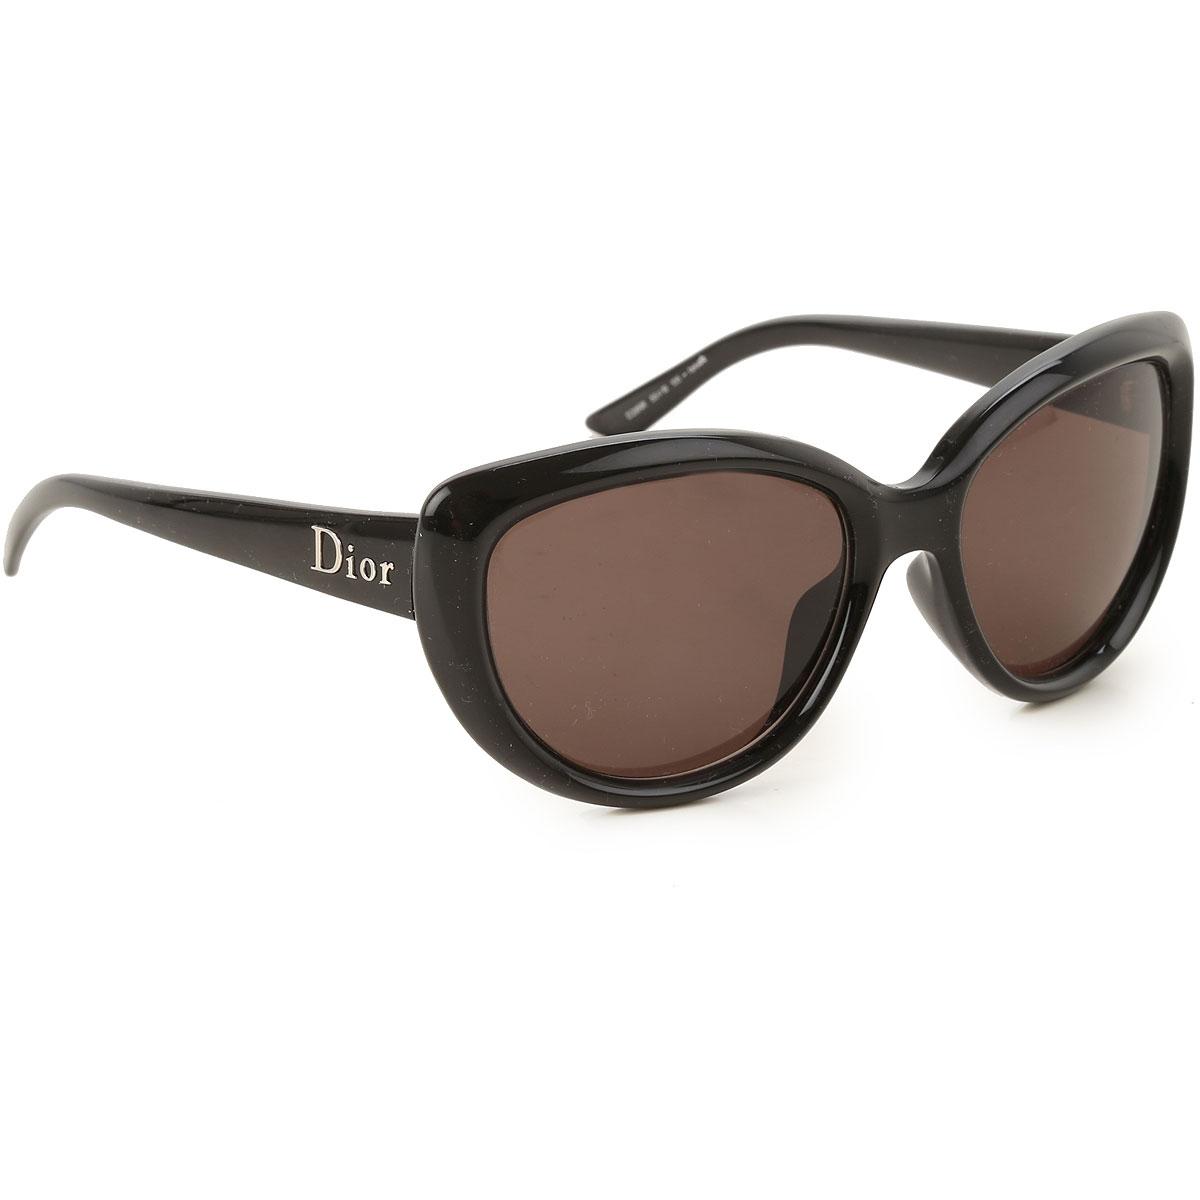 Christian Dior Sunglasses On Sale, Black, 2019